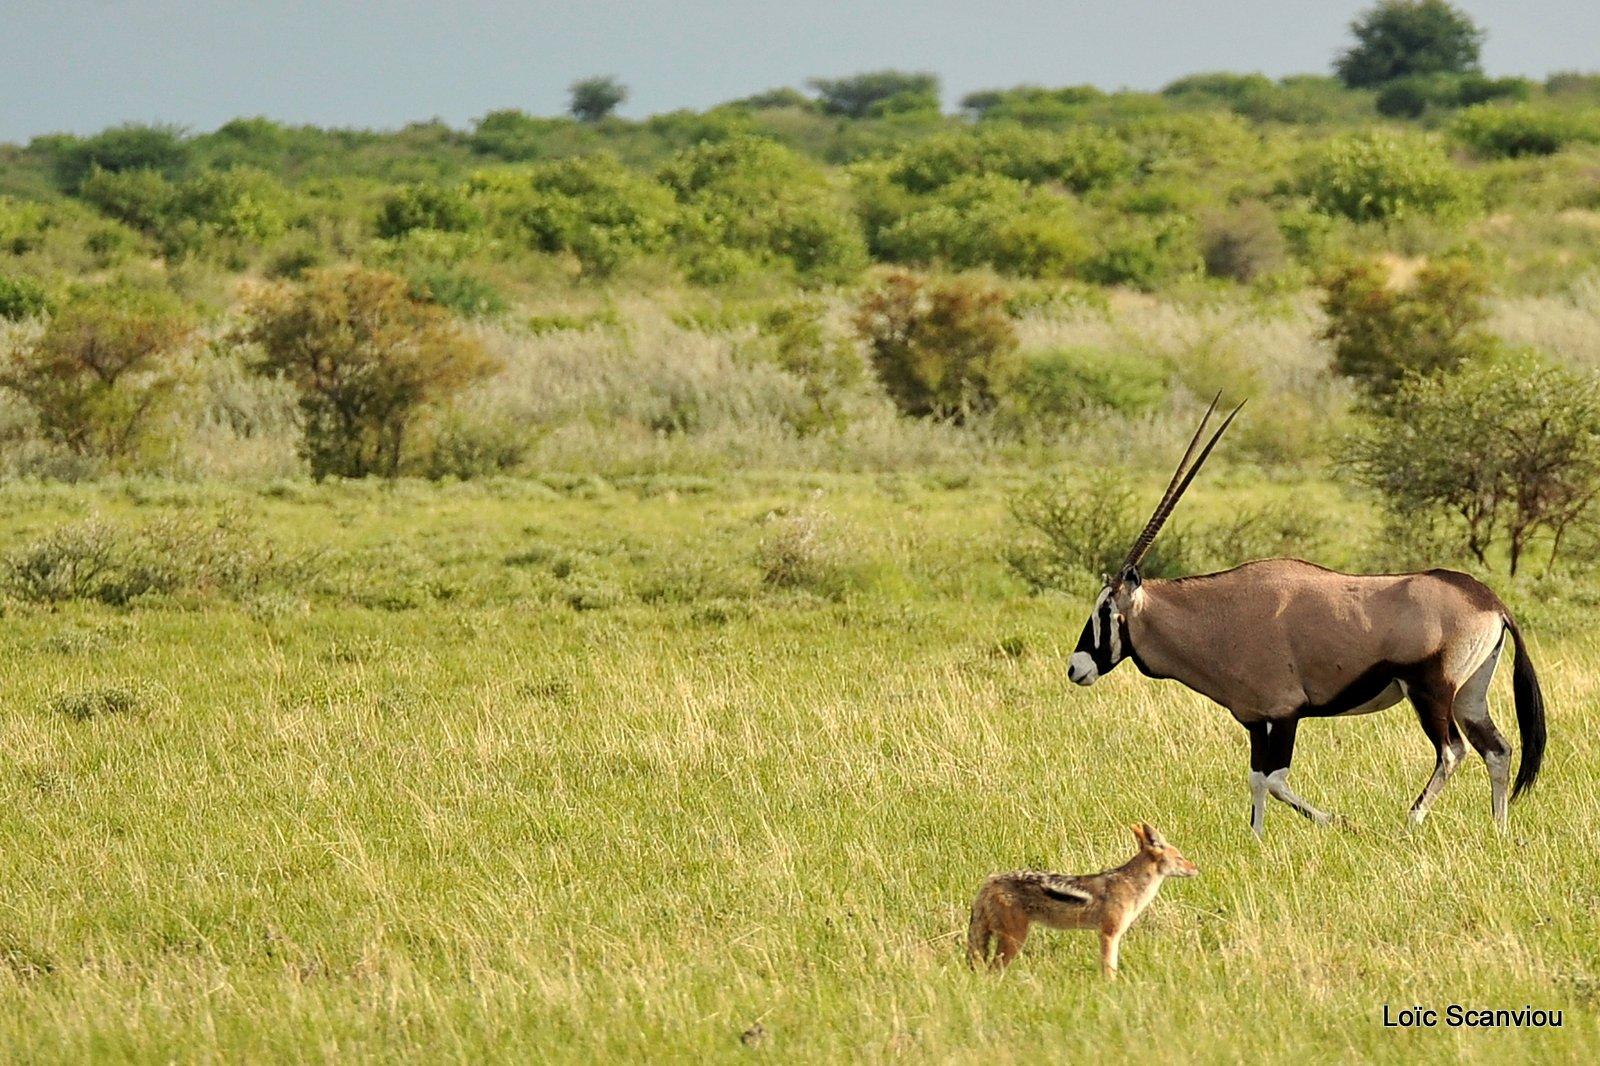 Chacal et oryx/Jackal and Gemsbok (1)